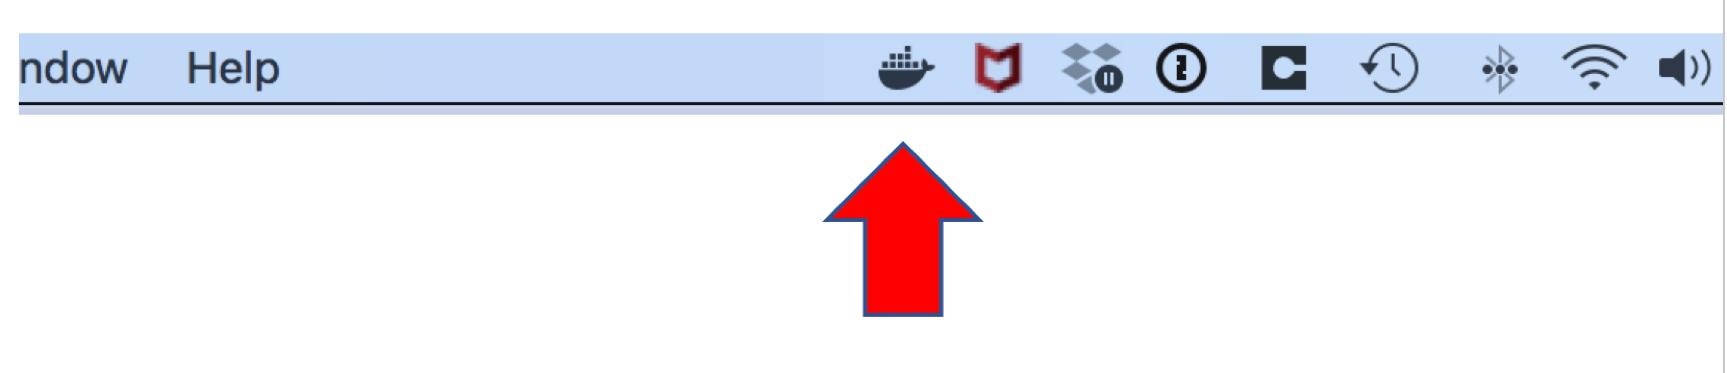 Docker icon in status bar